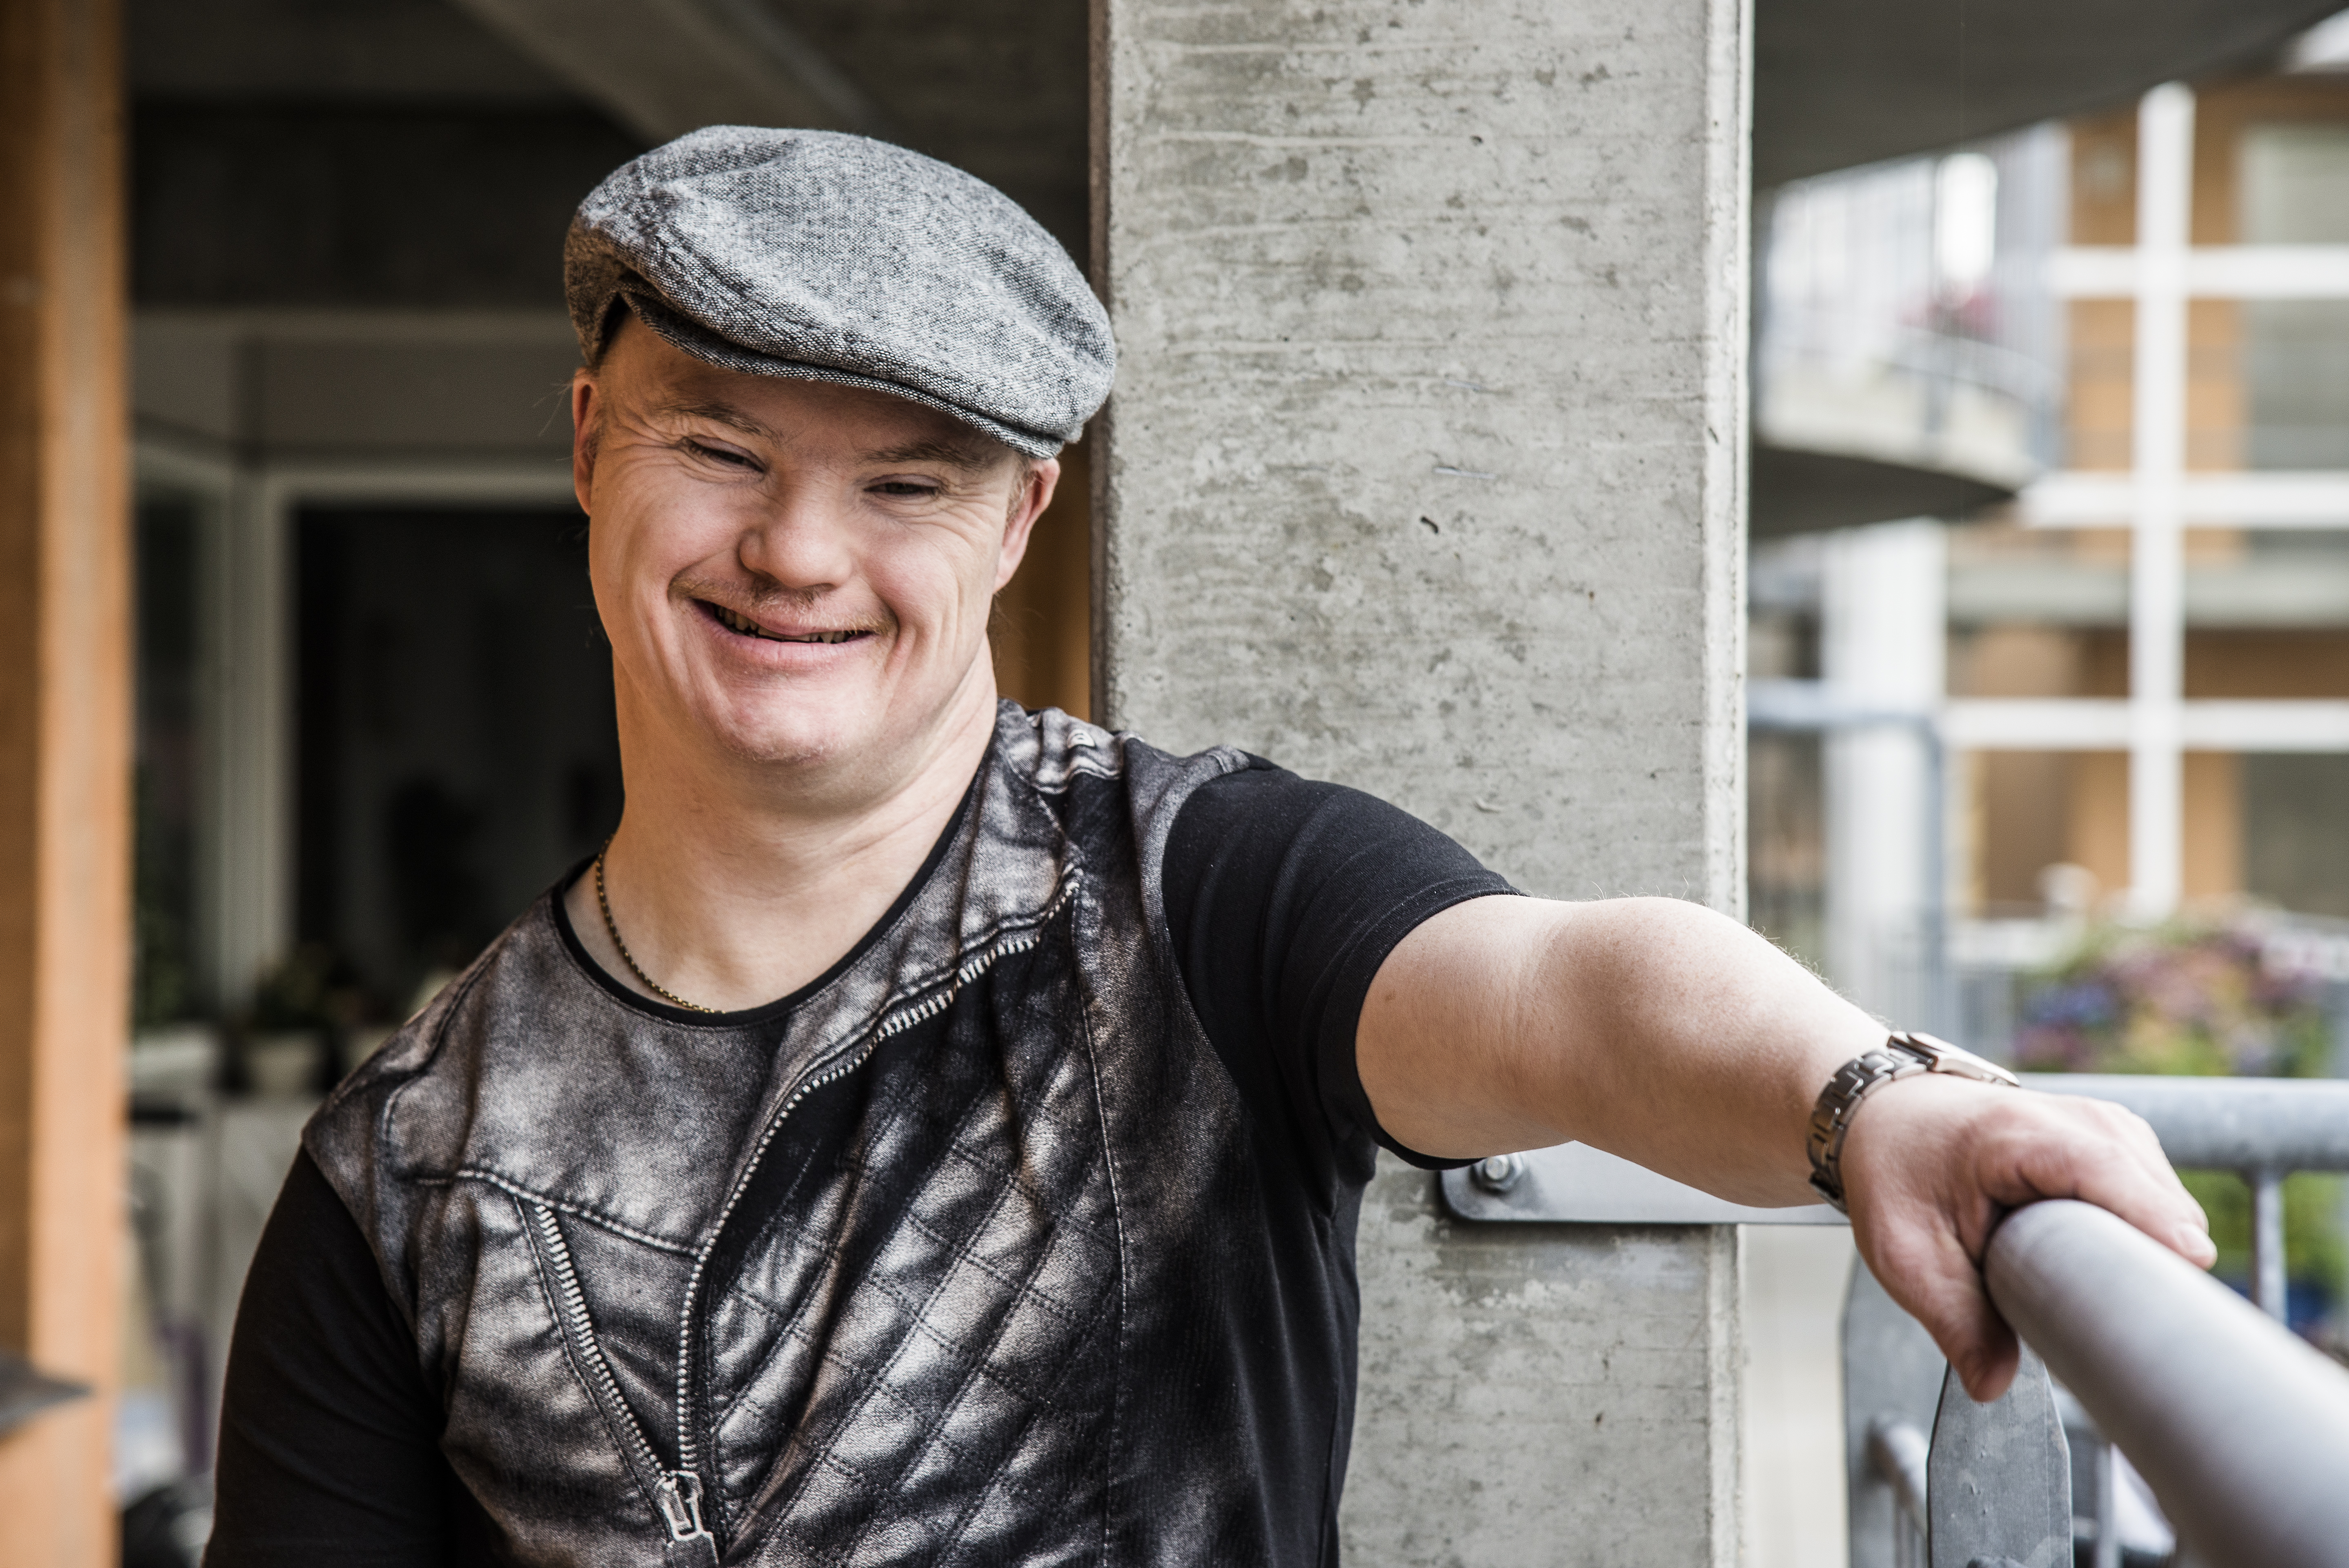 Jens Christian